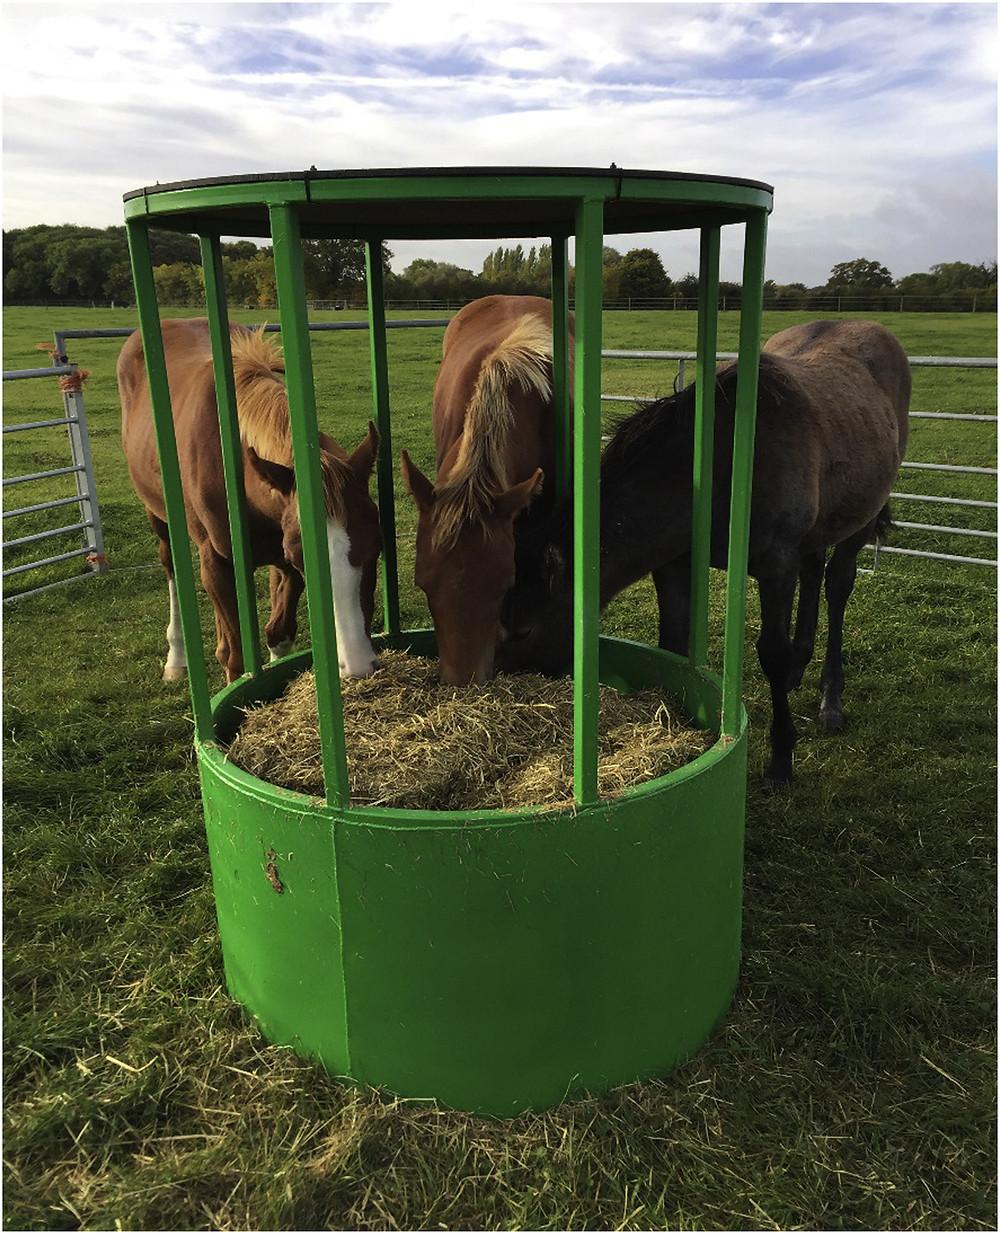 foals grazing at feeder